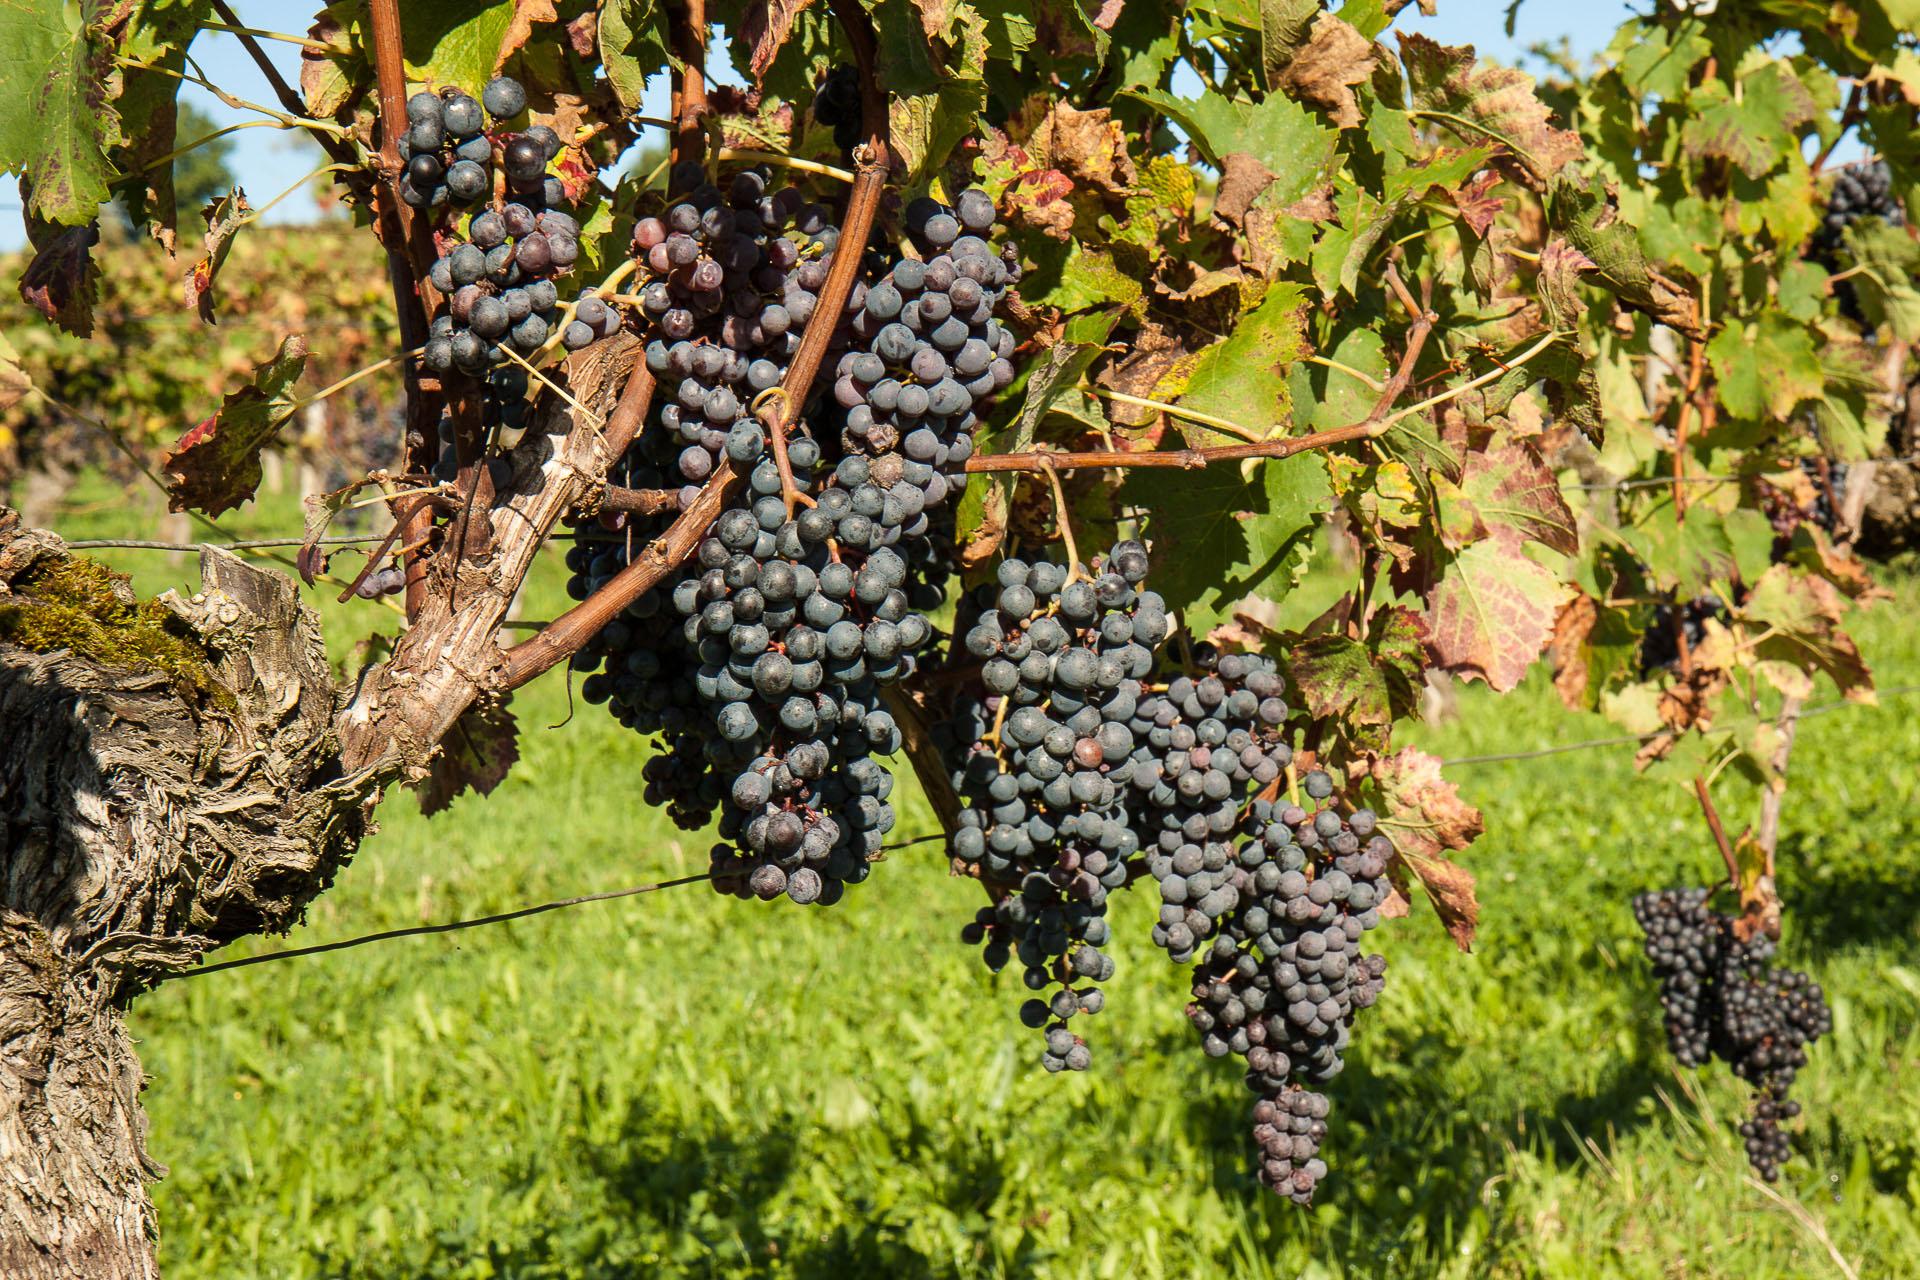 Vineyard in Bordeaux, France